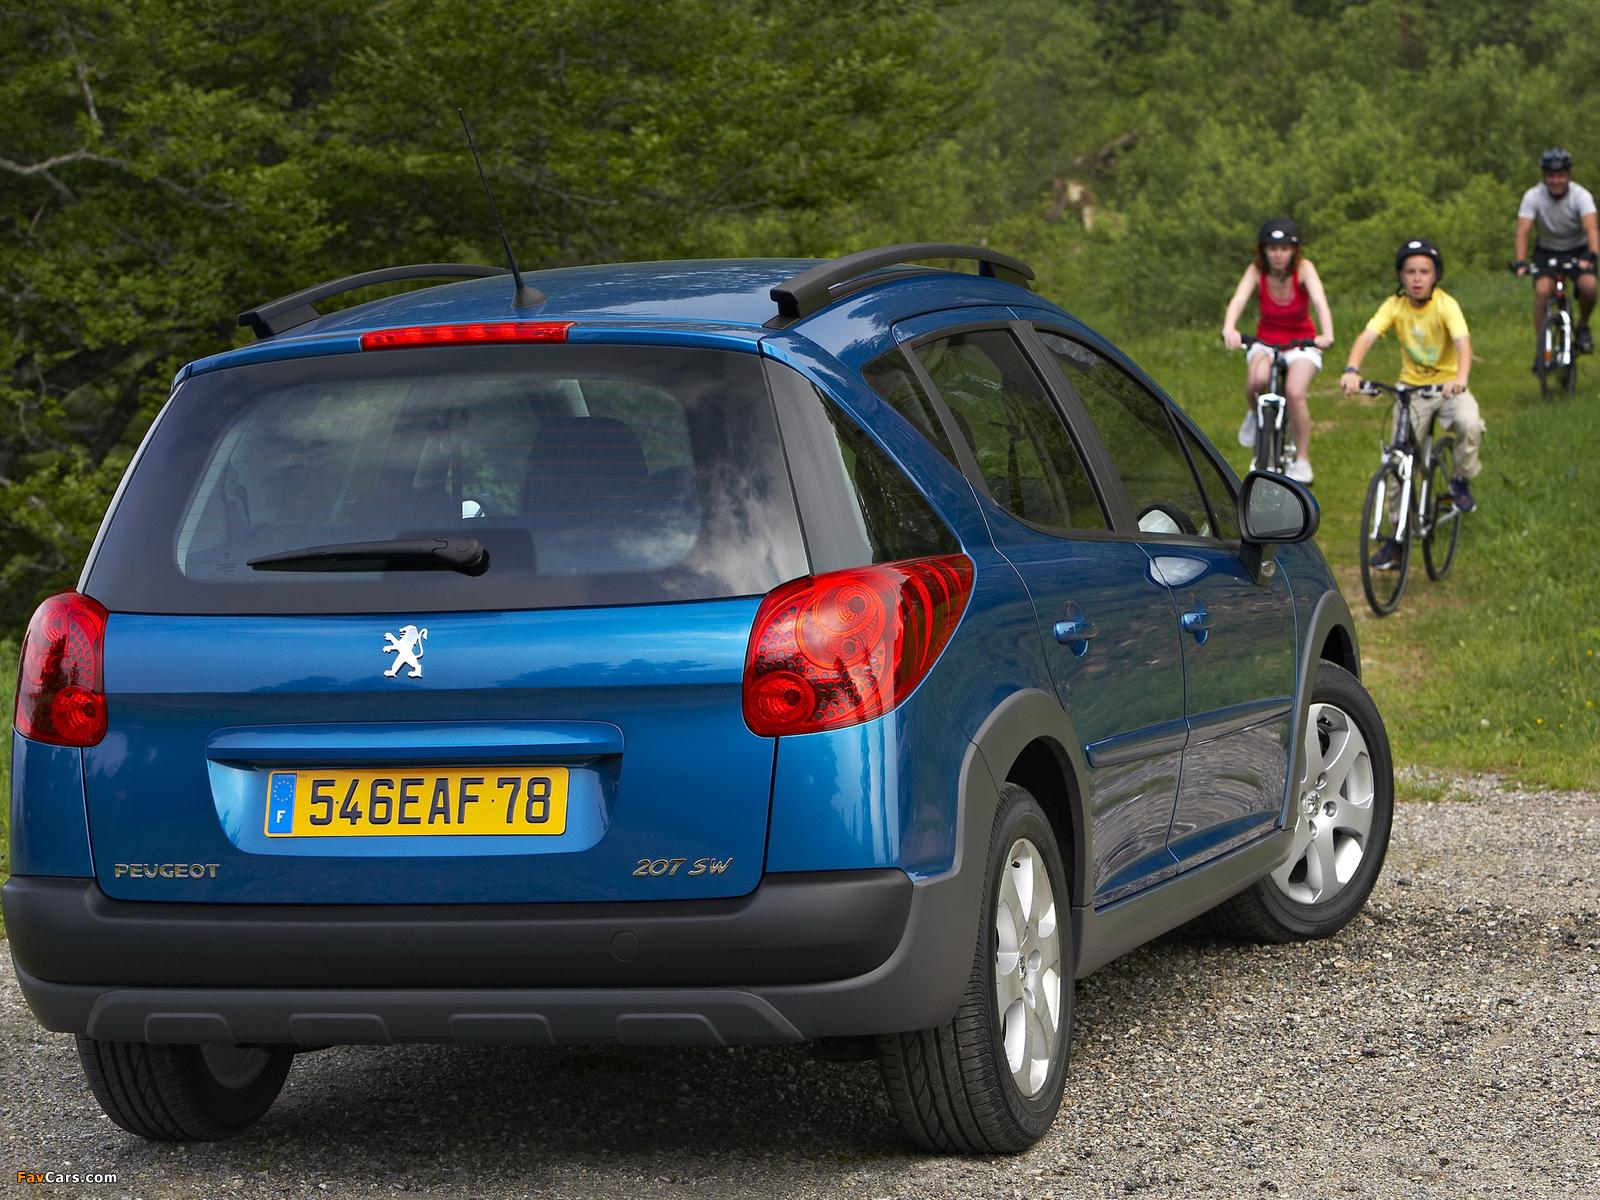 Peugeot 207 SW Outdoor 2008 images (1600 x 1200)